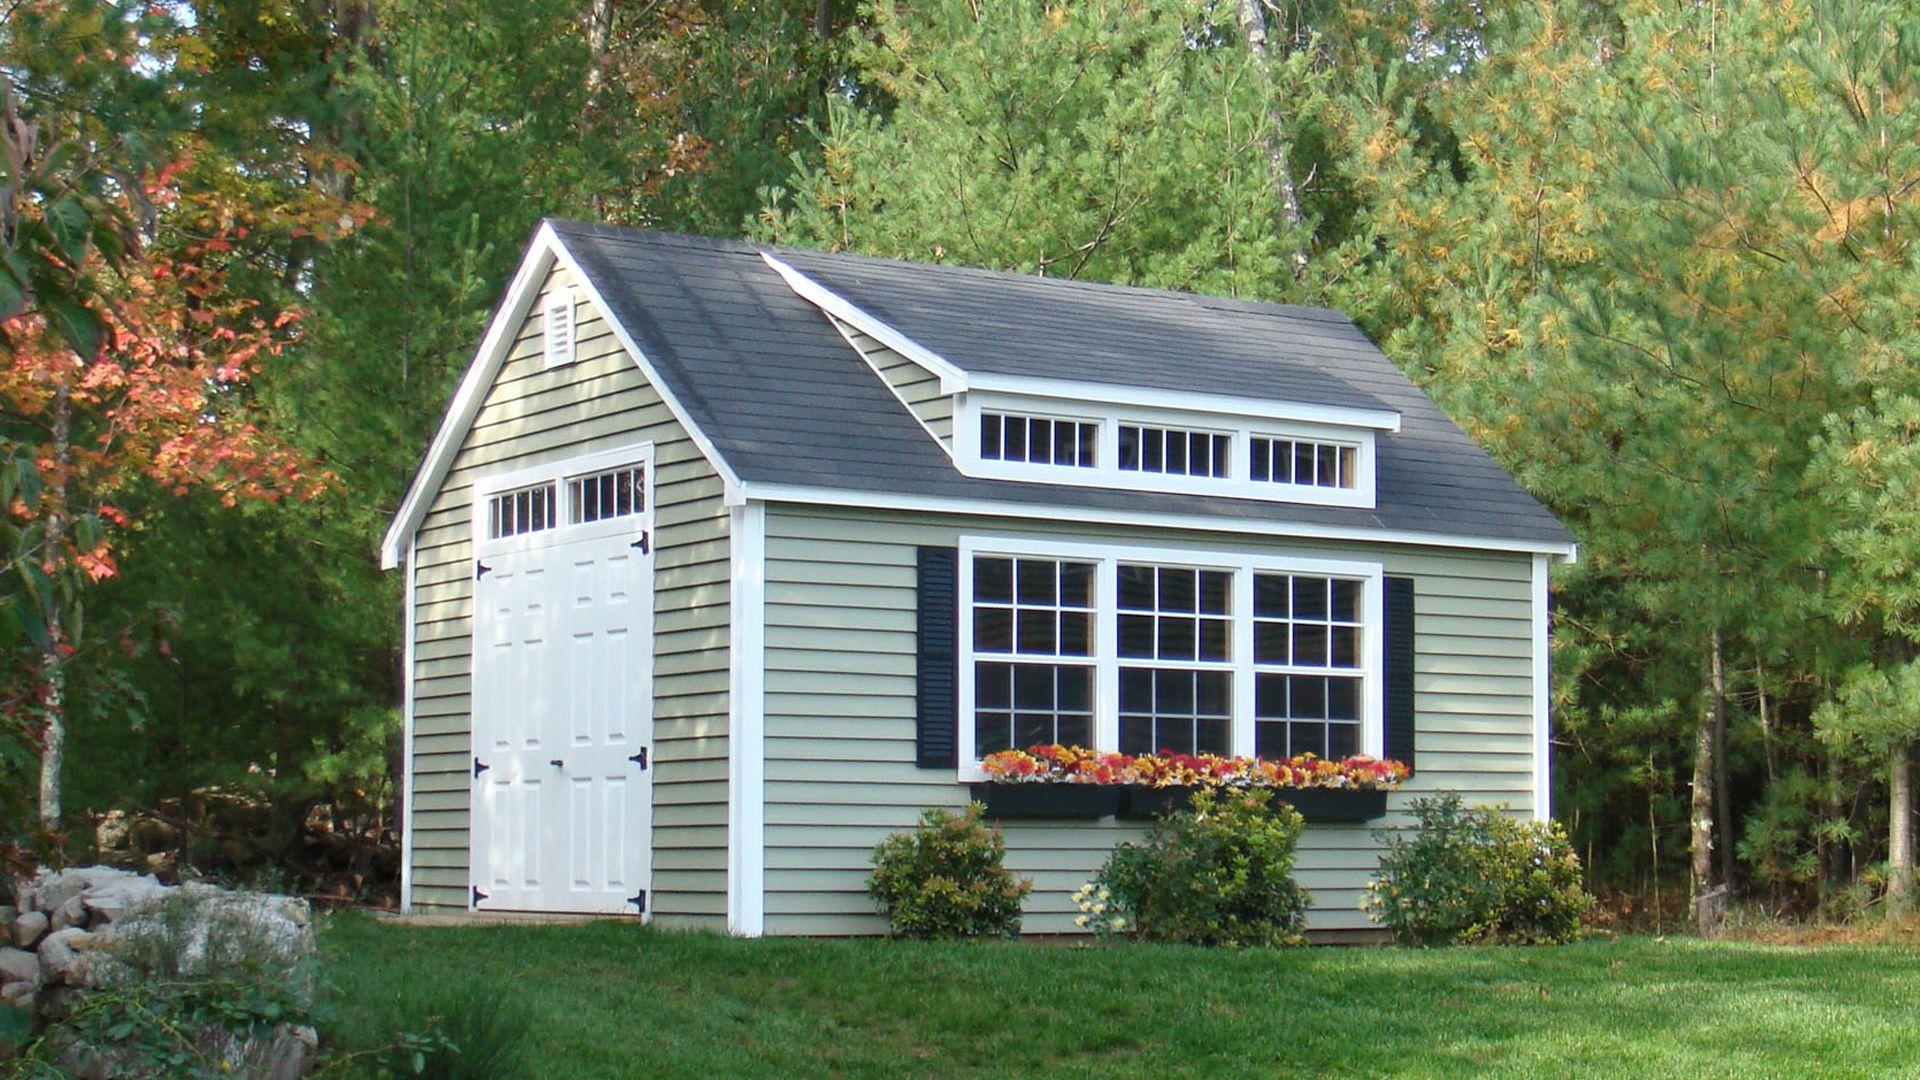 Dormer costs modernize house exterior pinterest for Shed with dormer